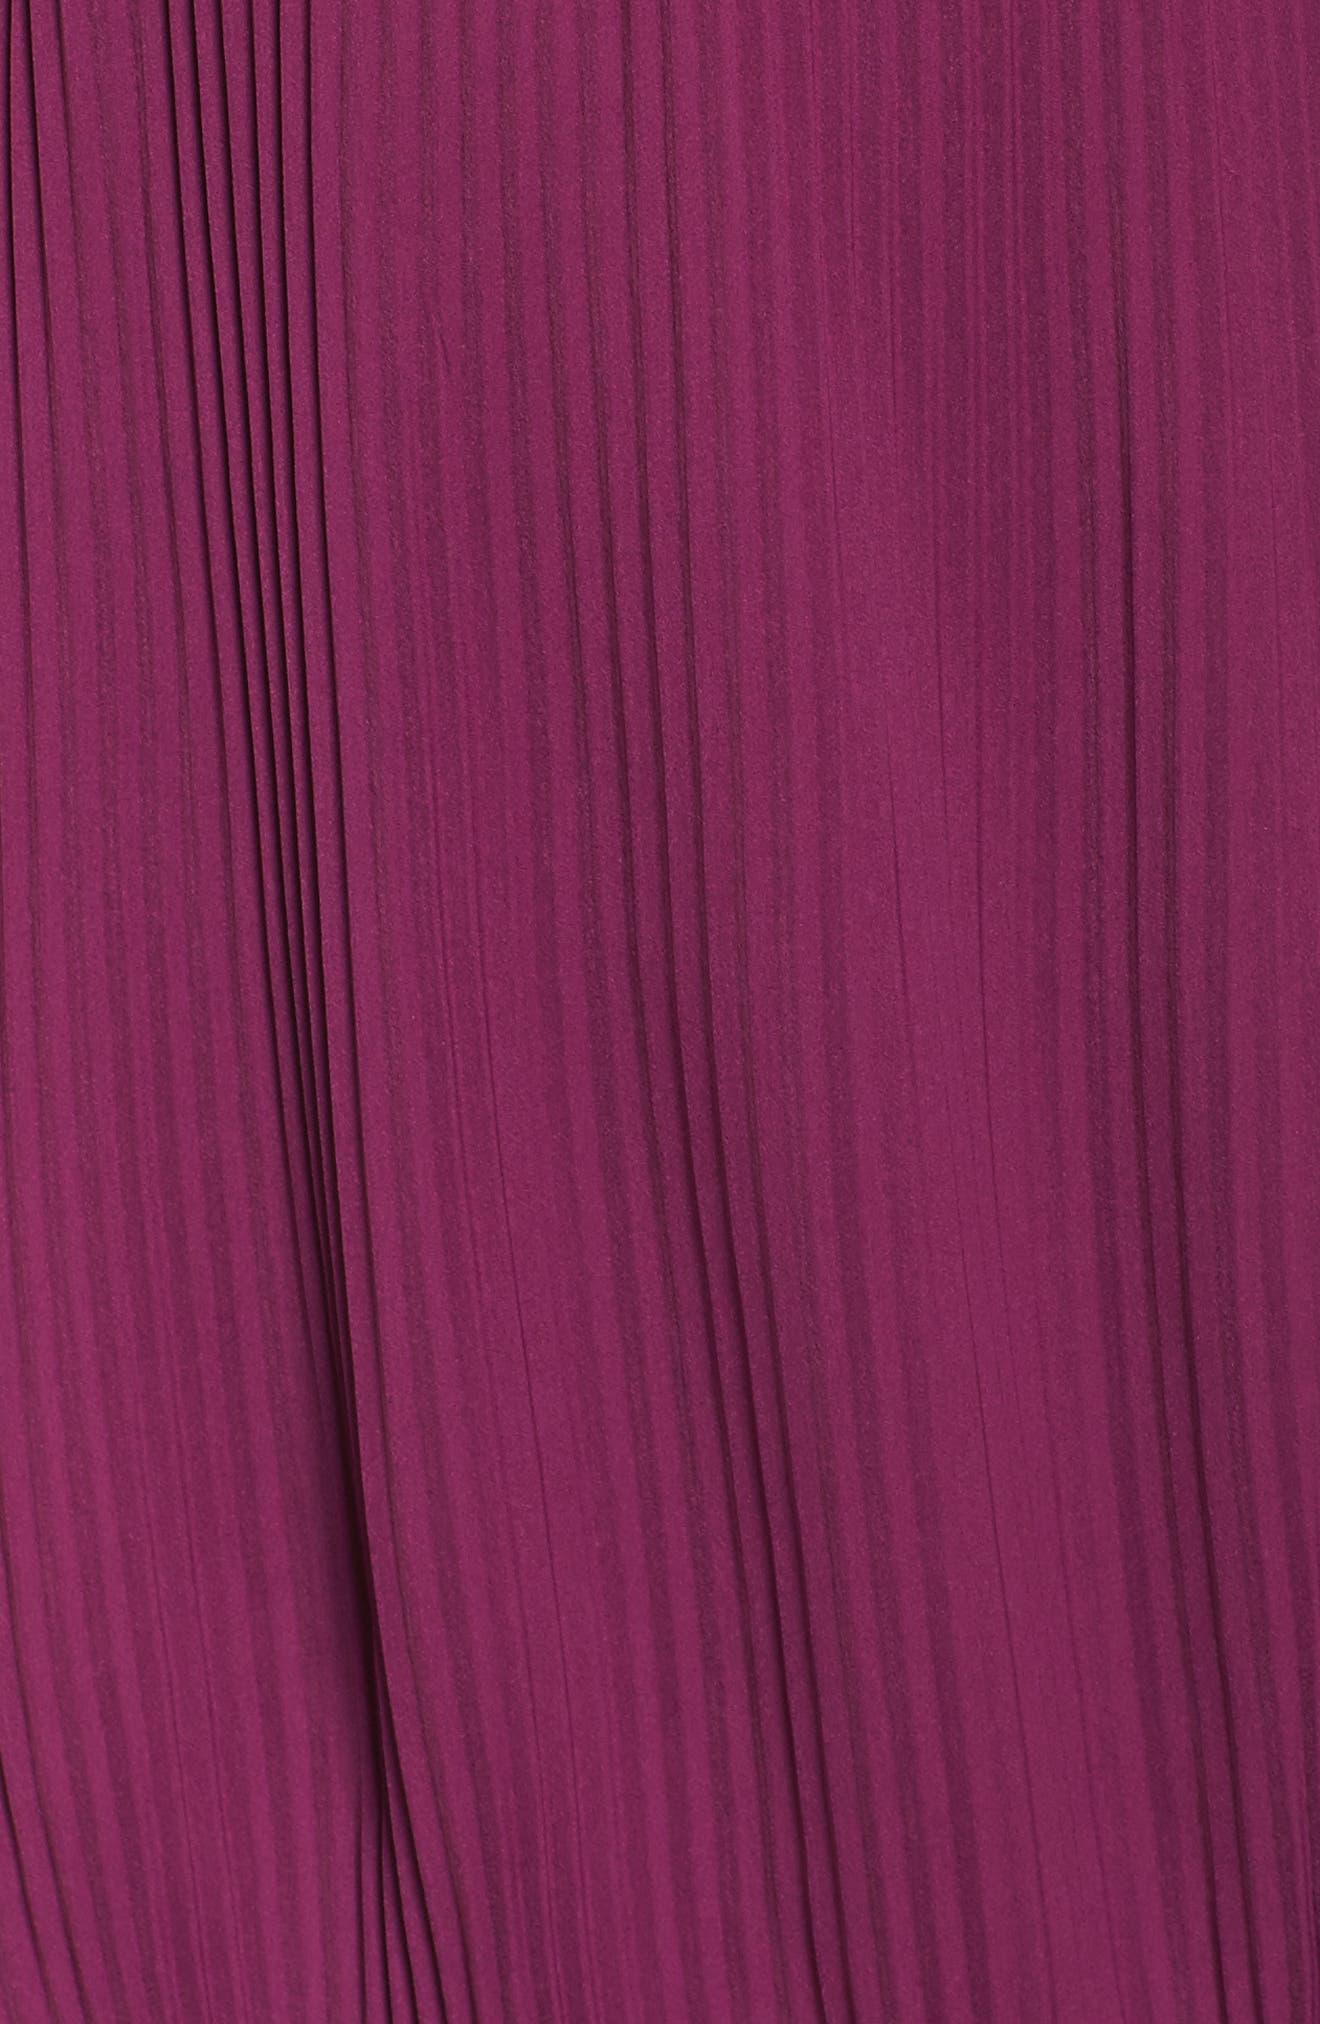 Mademoiselle Ruffle Swing Dress,                             Alternate thumbnail 5, color,